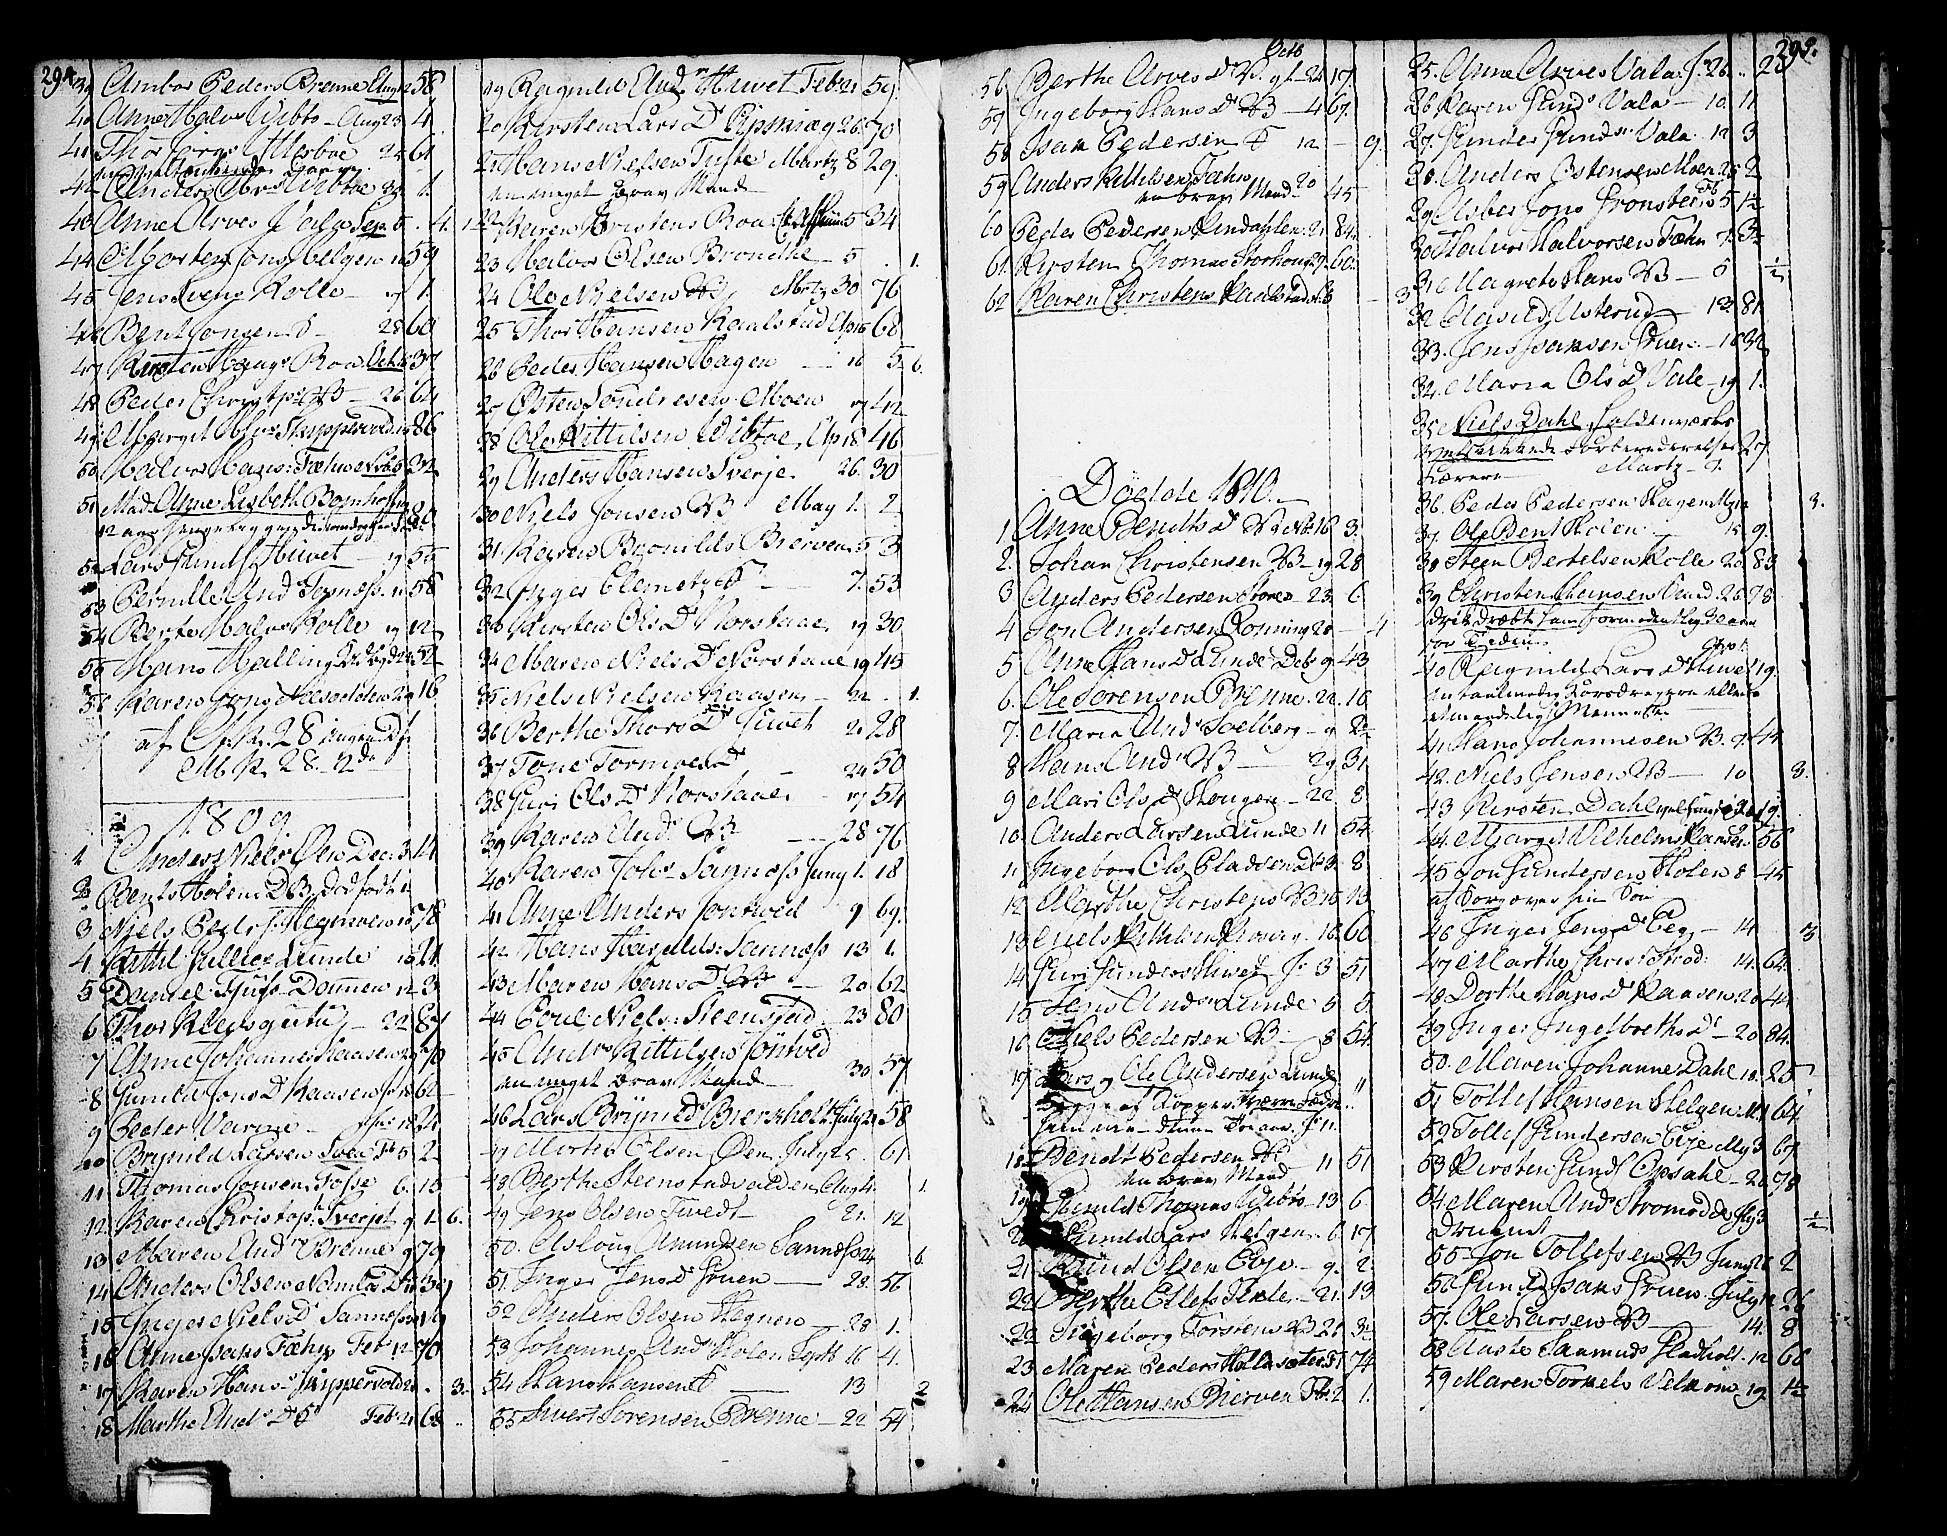 SAKO, Holla kirkebøker, F/Fa/L0002: Ministerialbok nr. 2, 1779-1814, s. 294-295